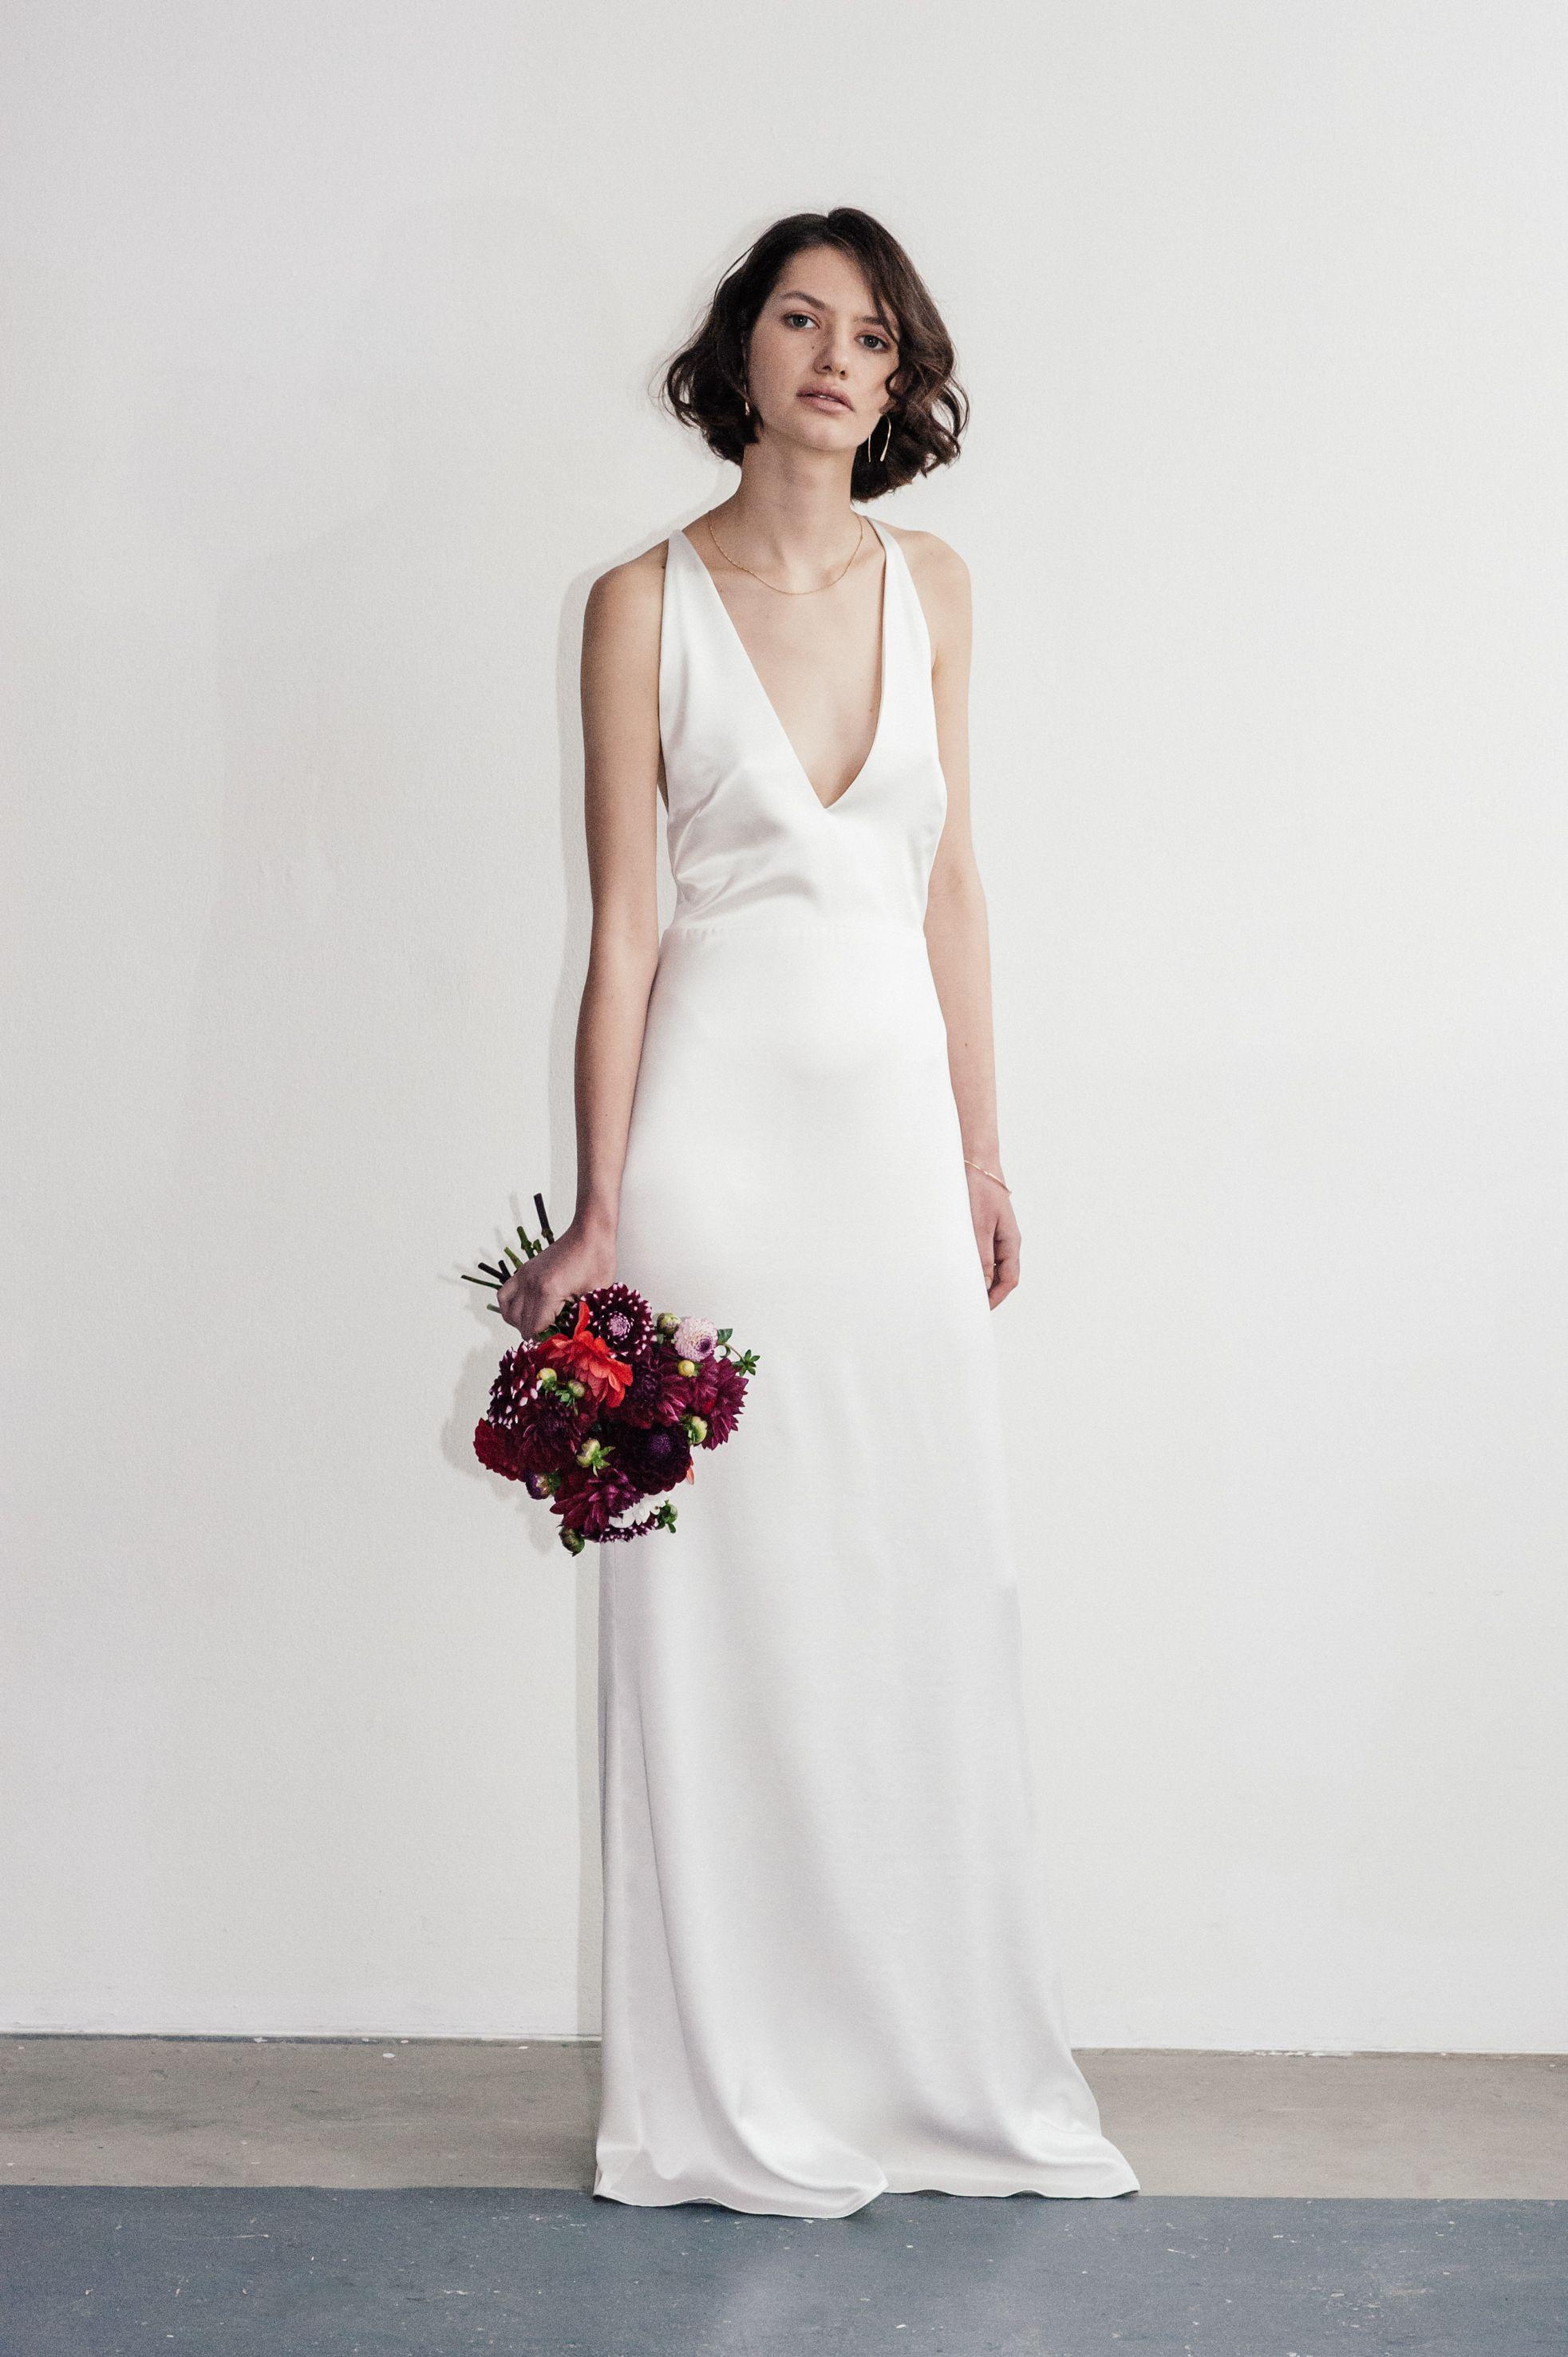 Lilly Ingenhoven Bridal - Dieses bodenlange, elegante Brautkleid ...